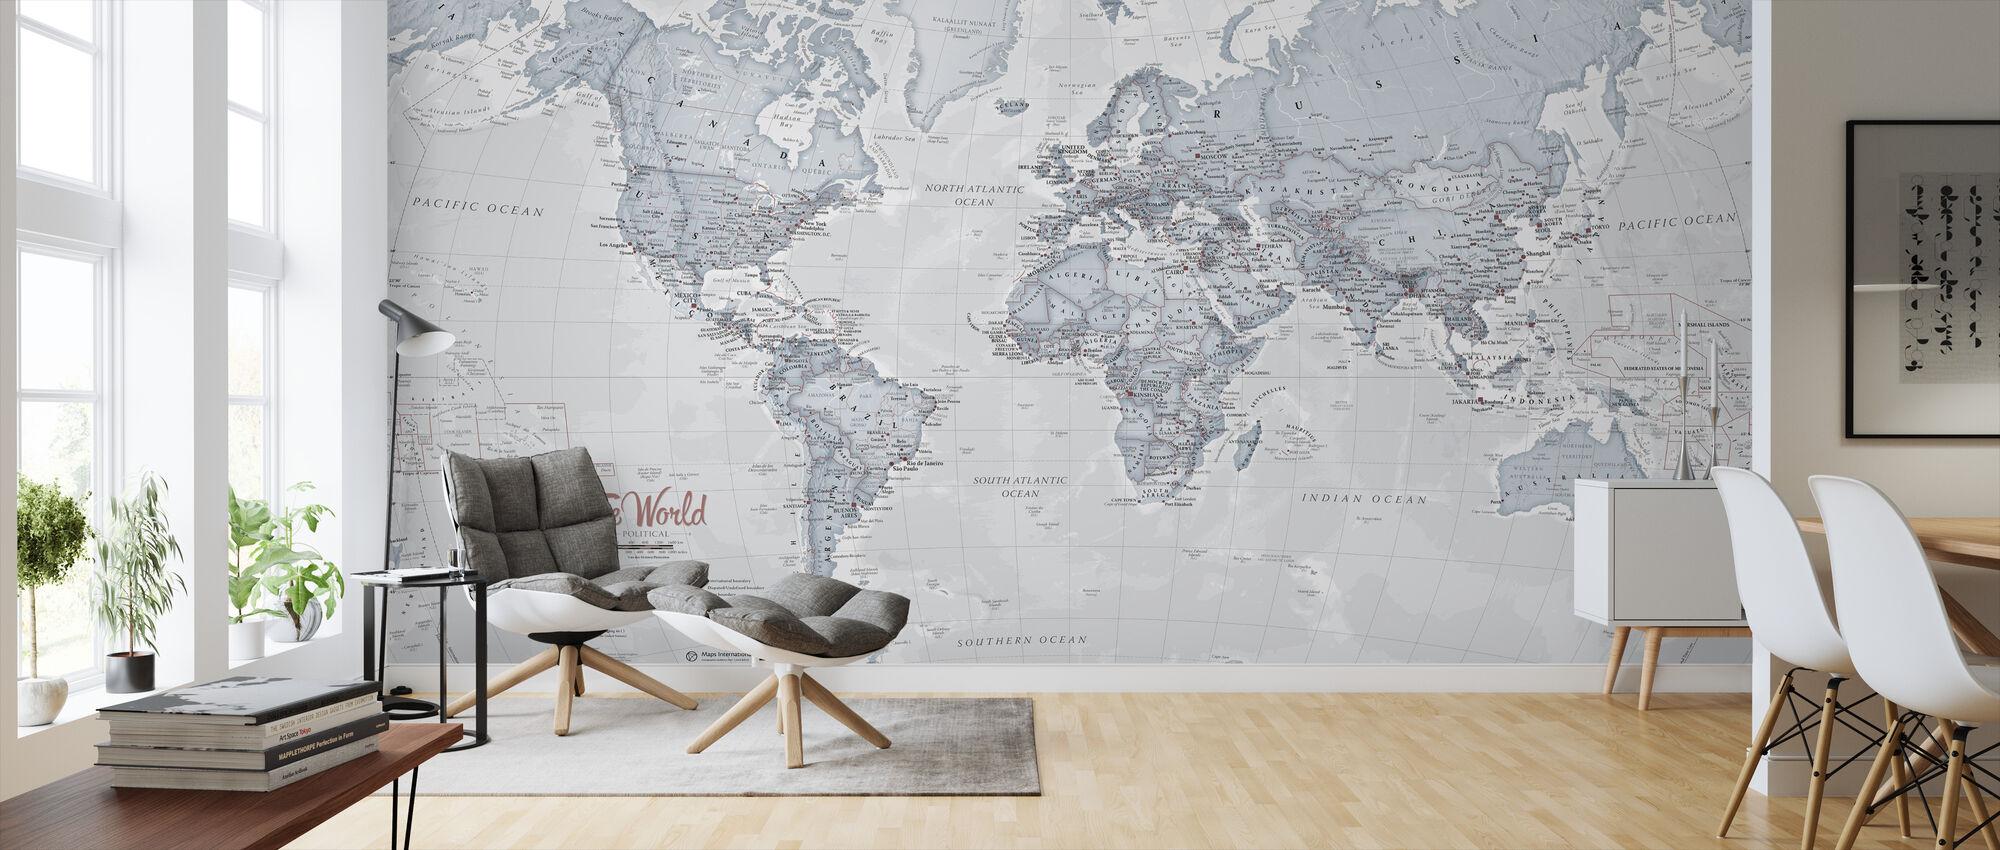 World Map Political Teal - Wallpaper - Living Room